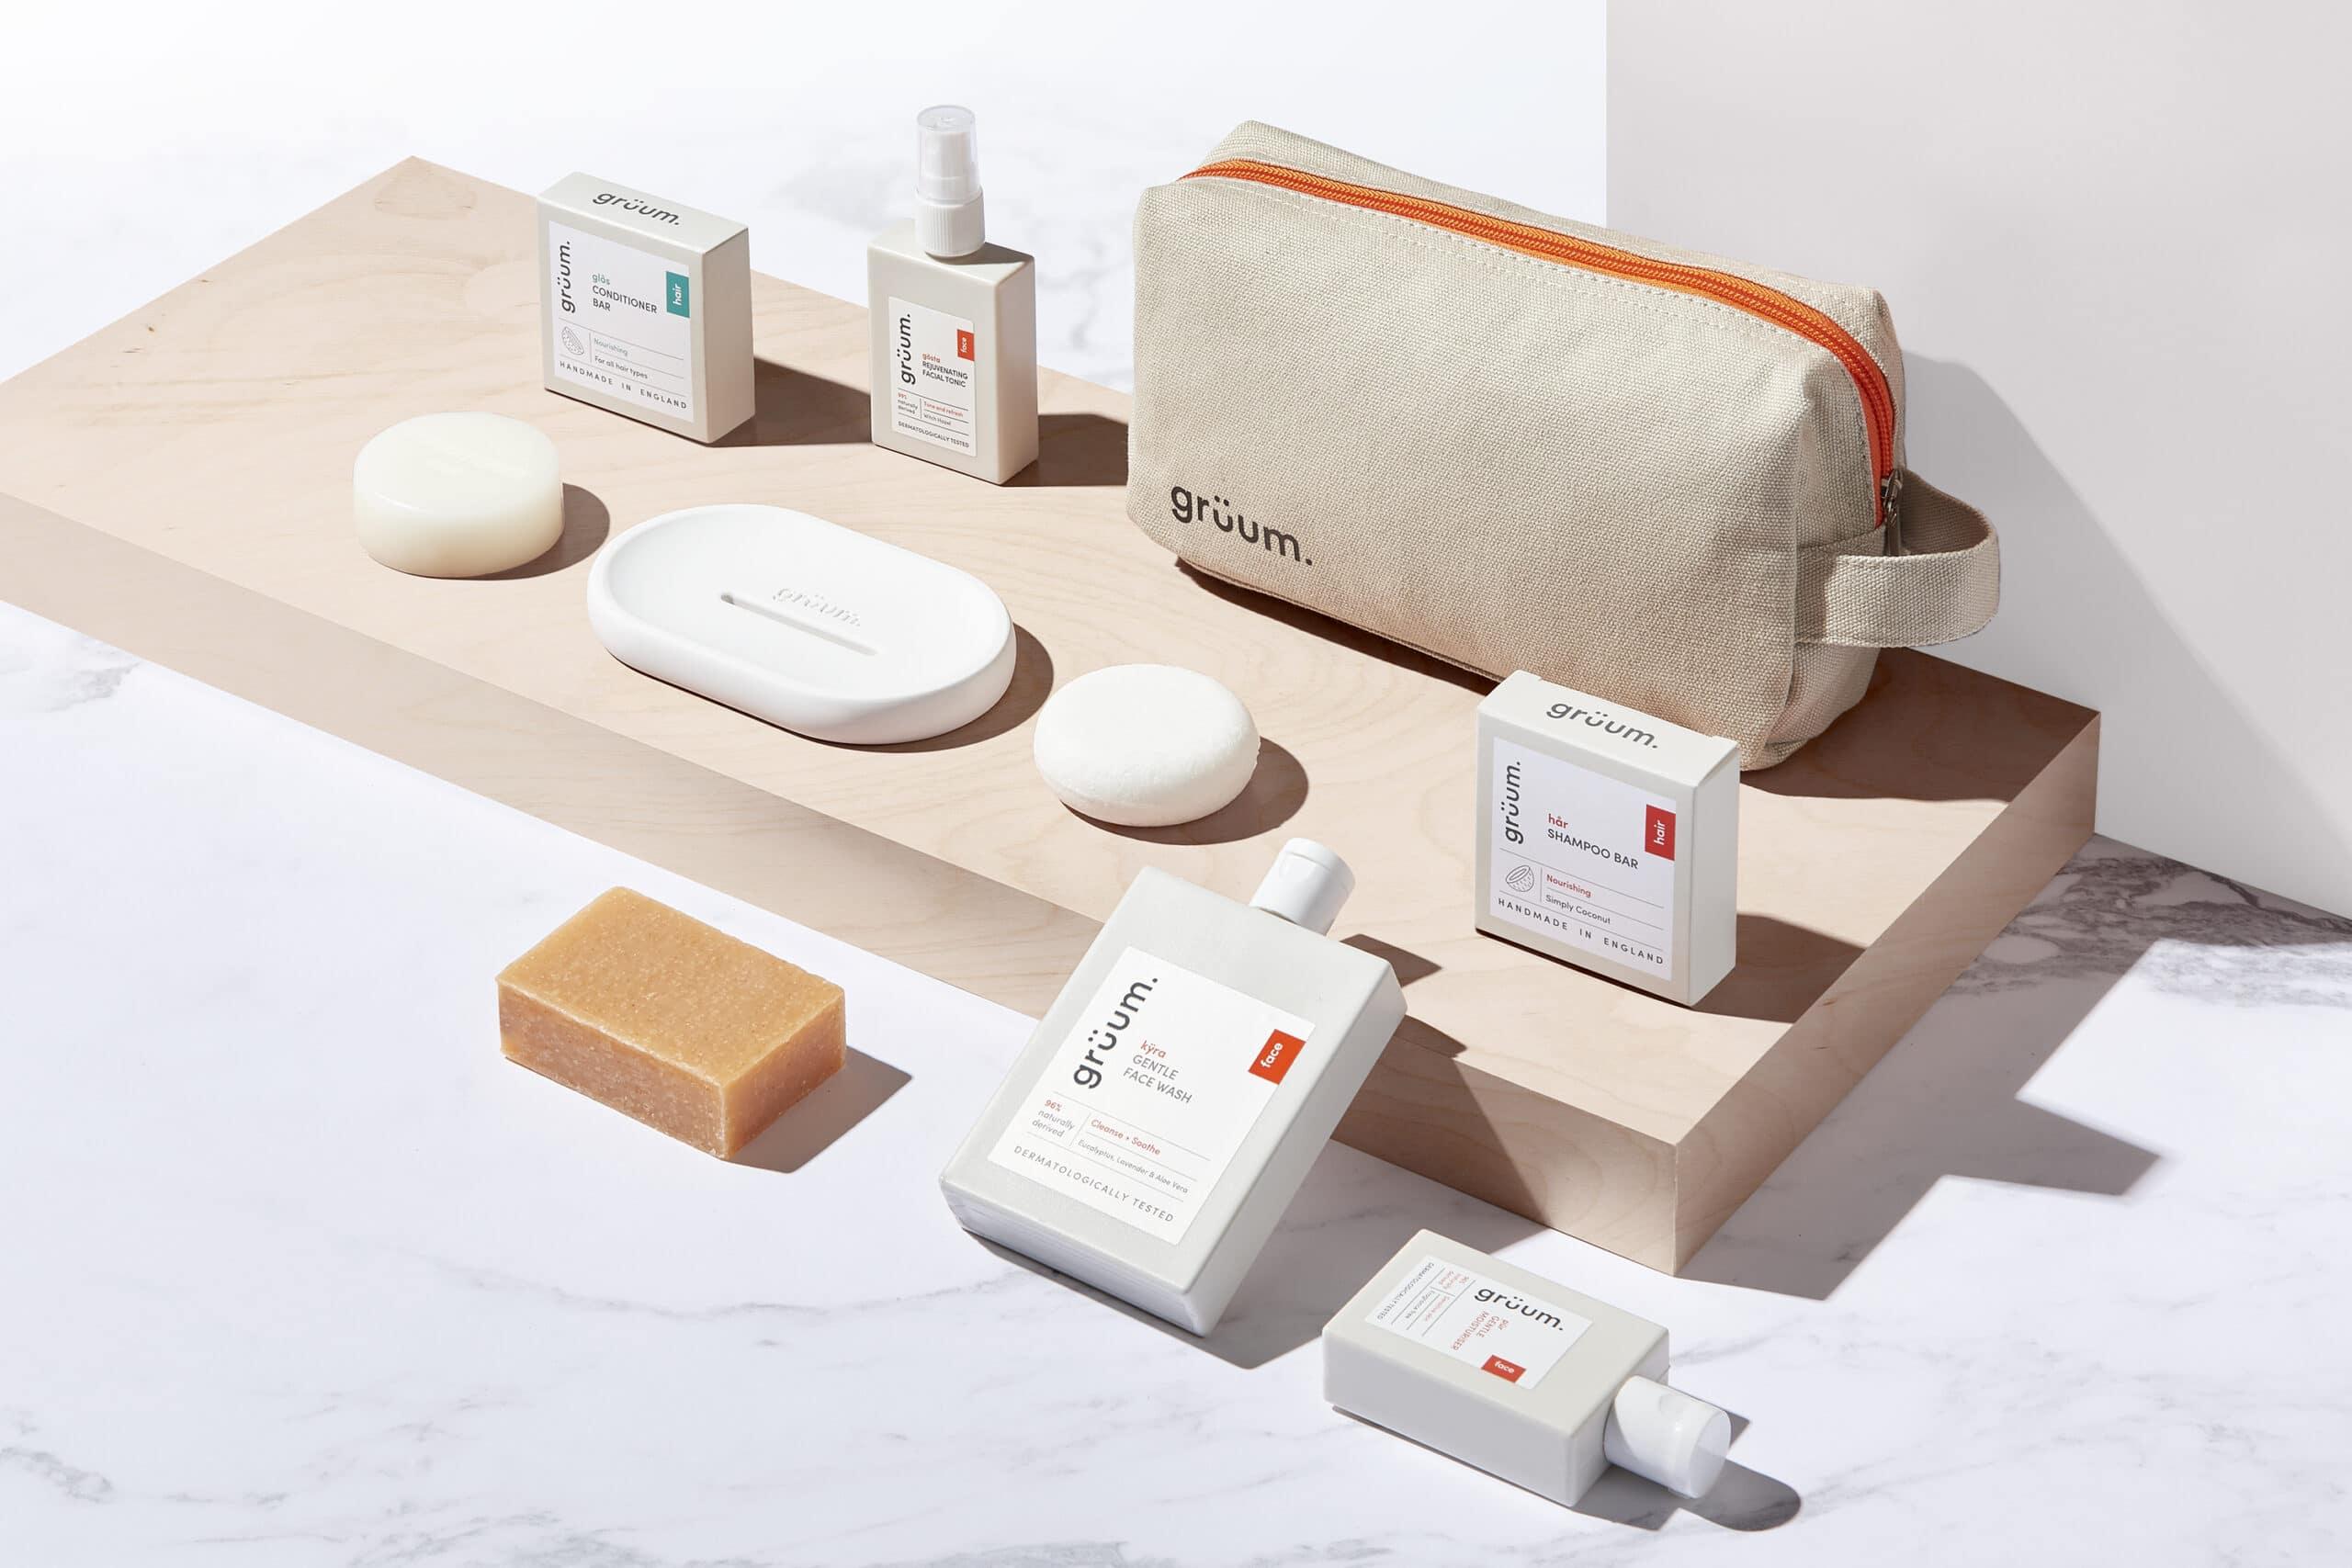 Gruum travel kit gift set product image with washbag, kyra face wash, shampoo bar, conditioner bar, pur moisturiser, body bar, gosta facial tonic and white halla soap dish